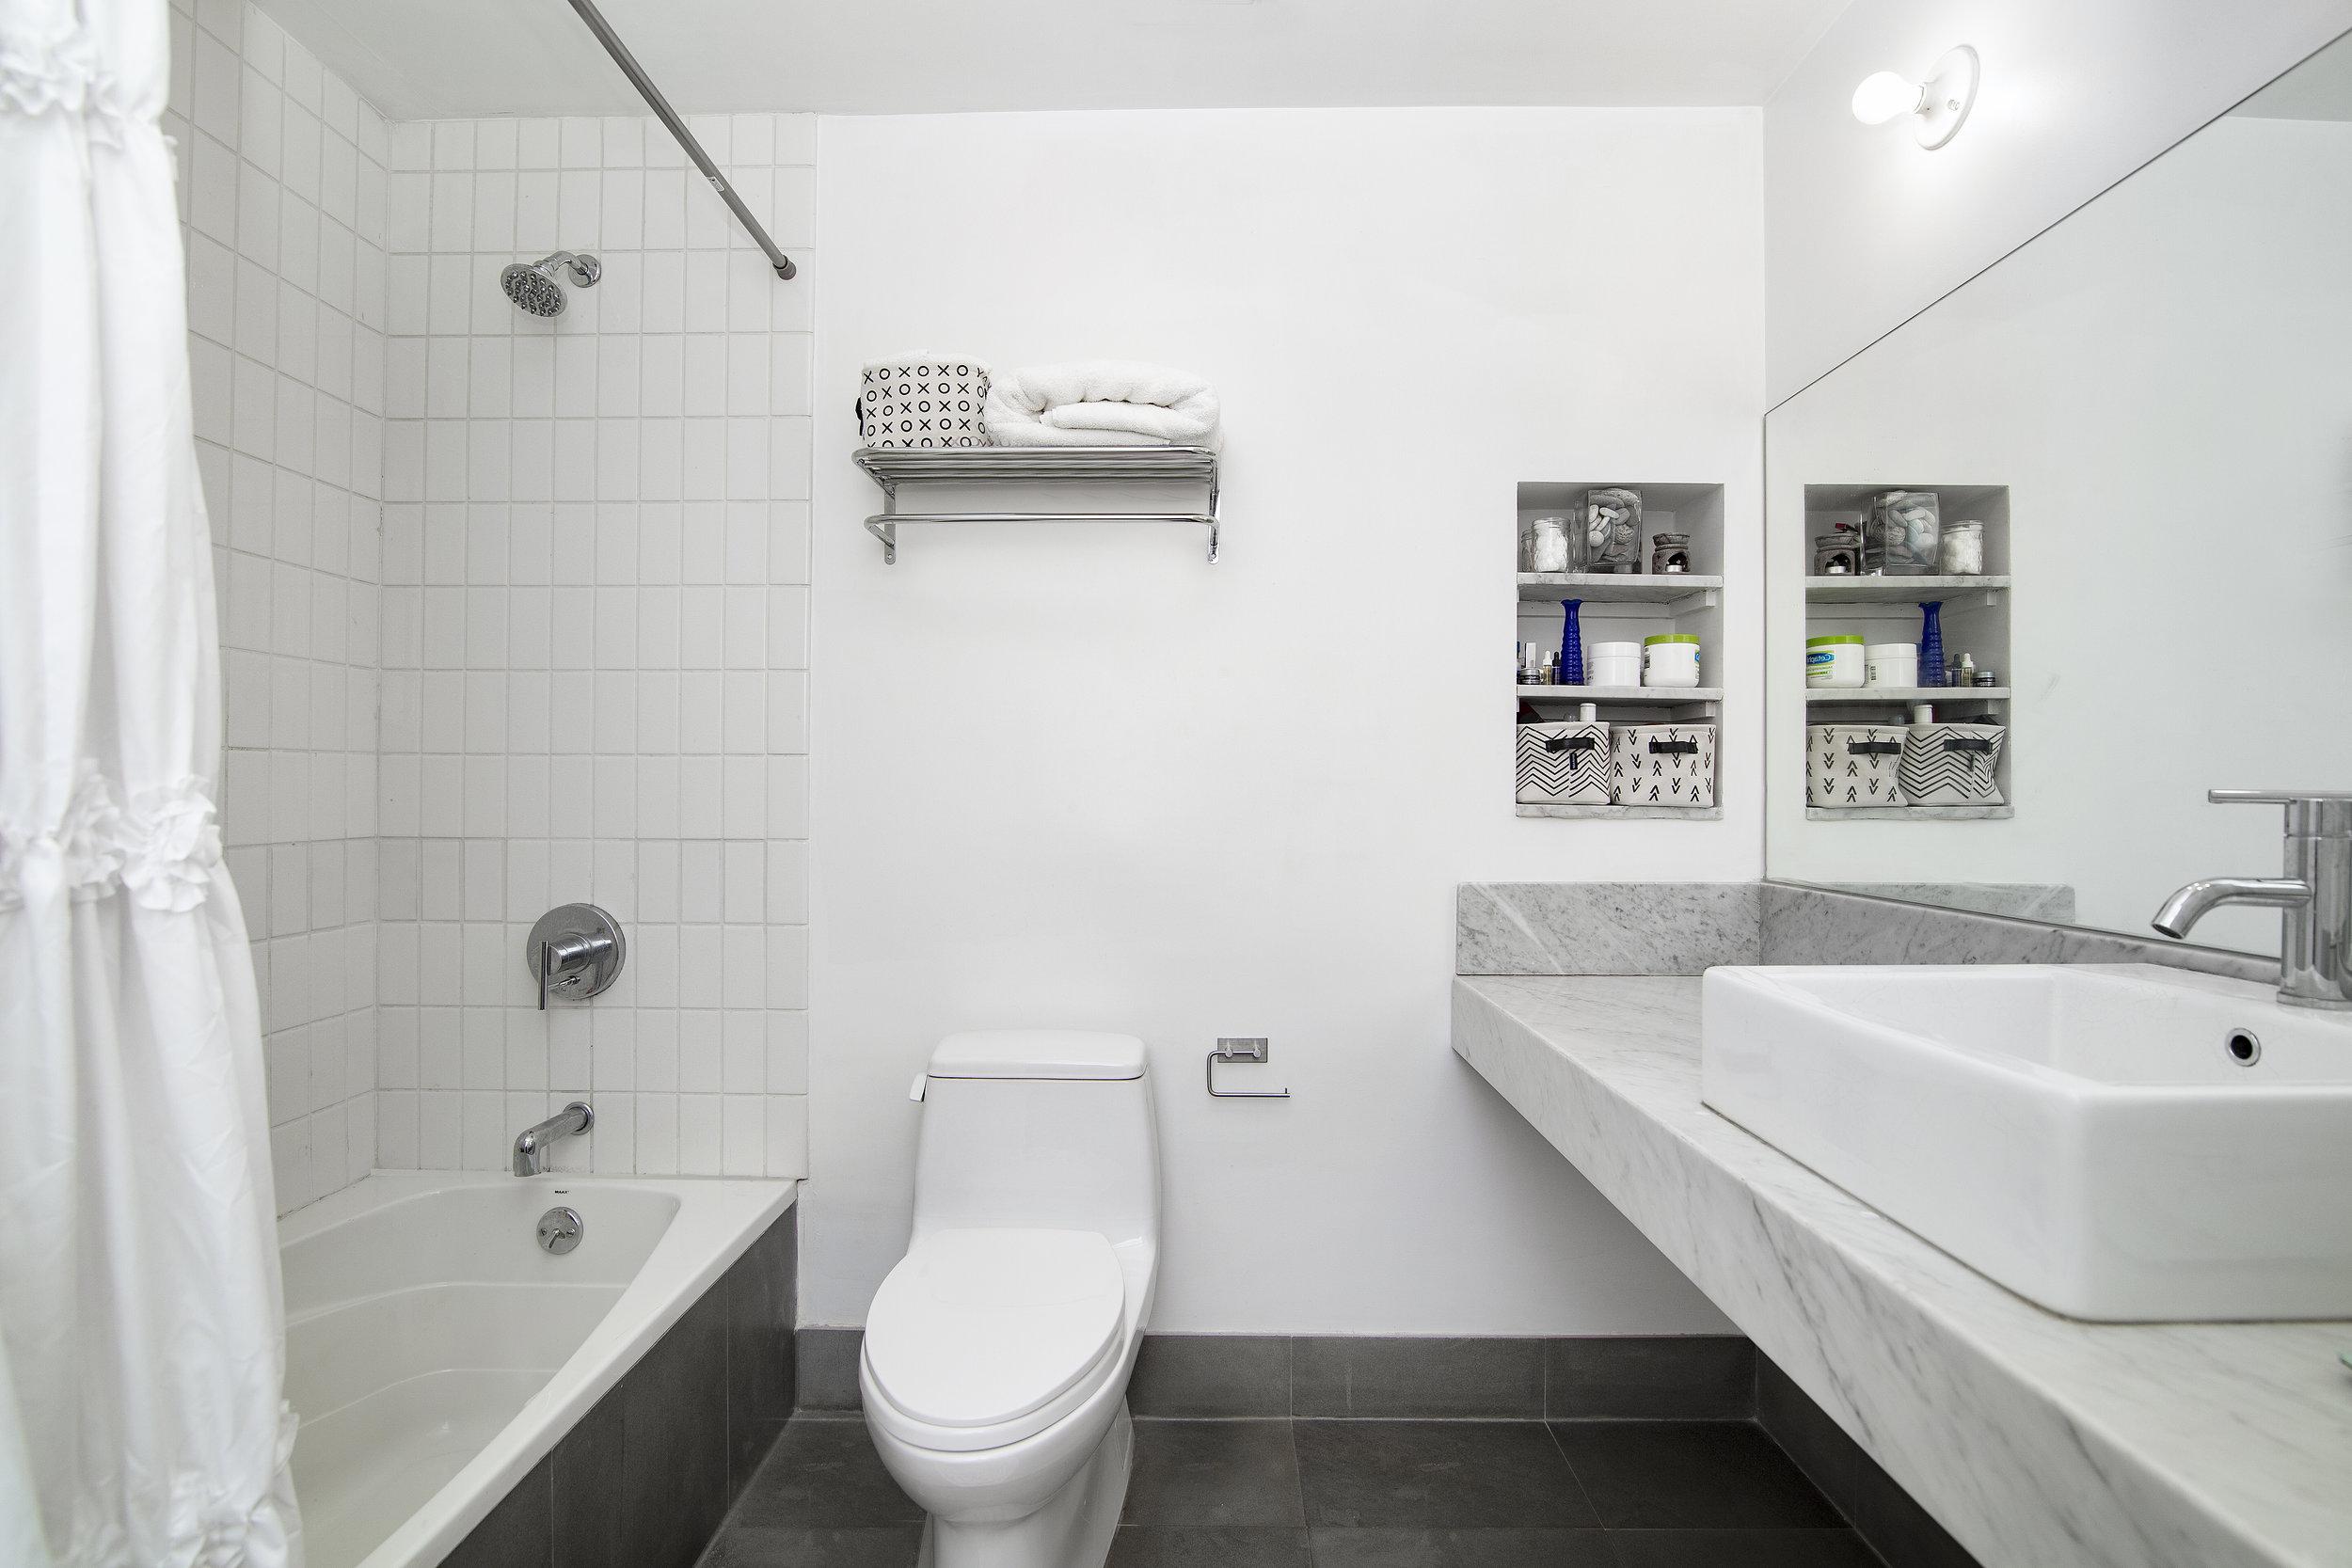 195 Spencer Street, Brooklyn NY guest bathroom.jpg